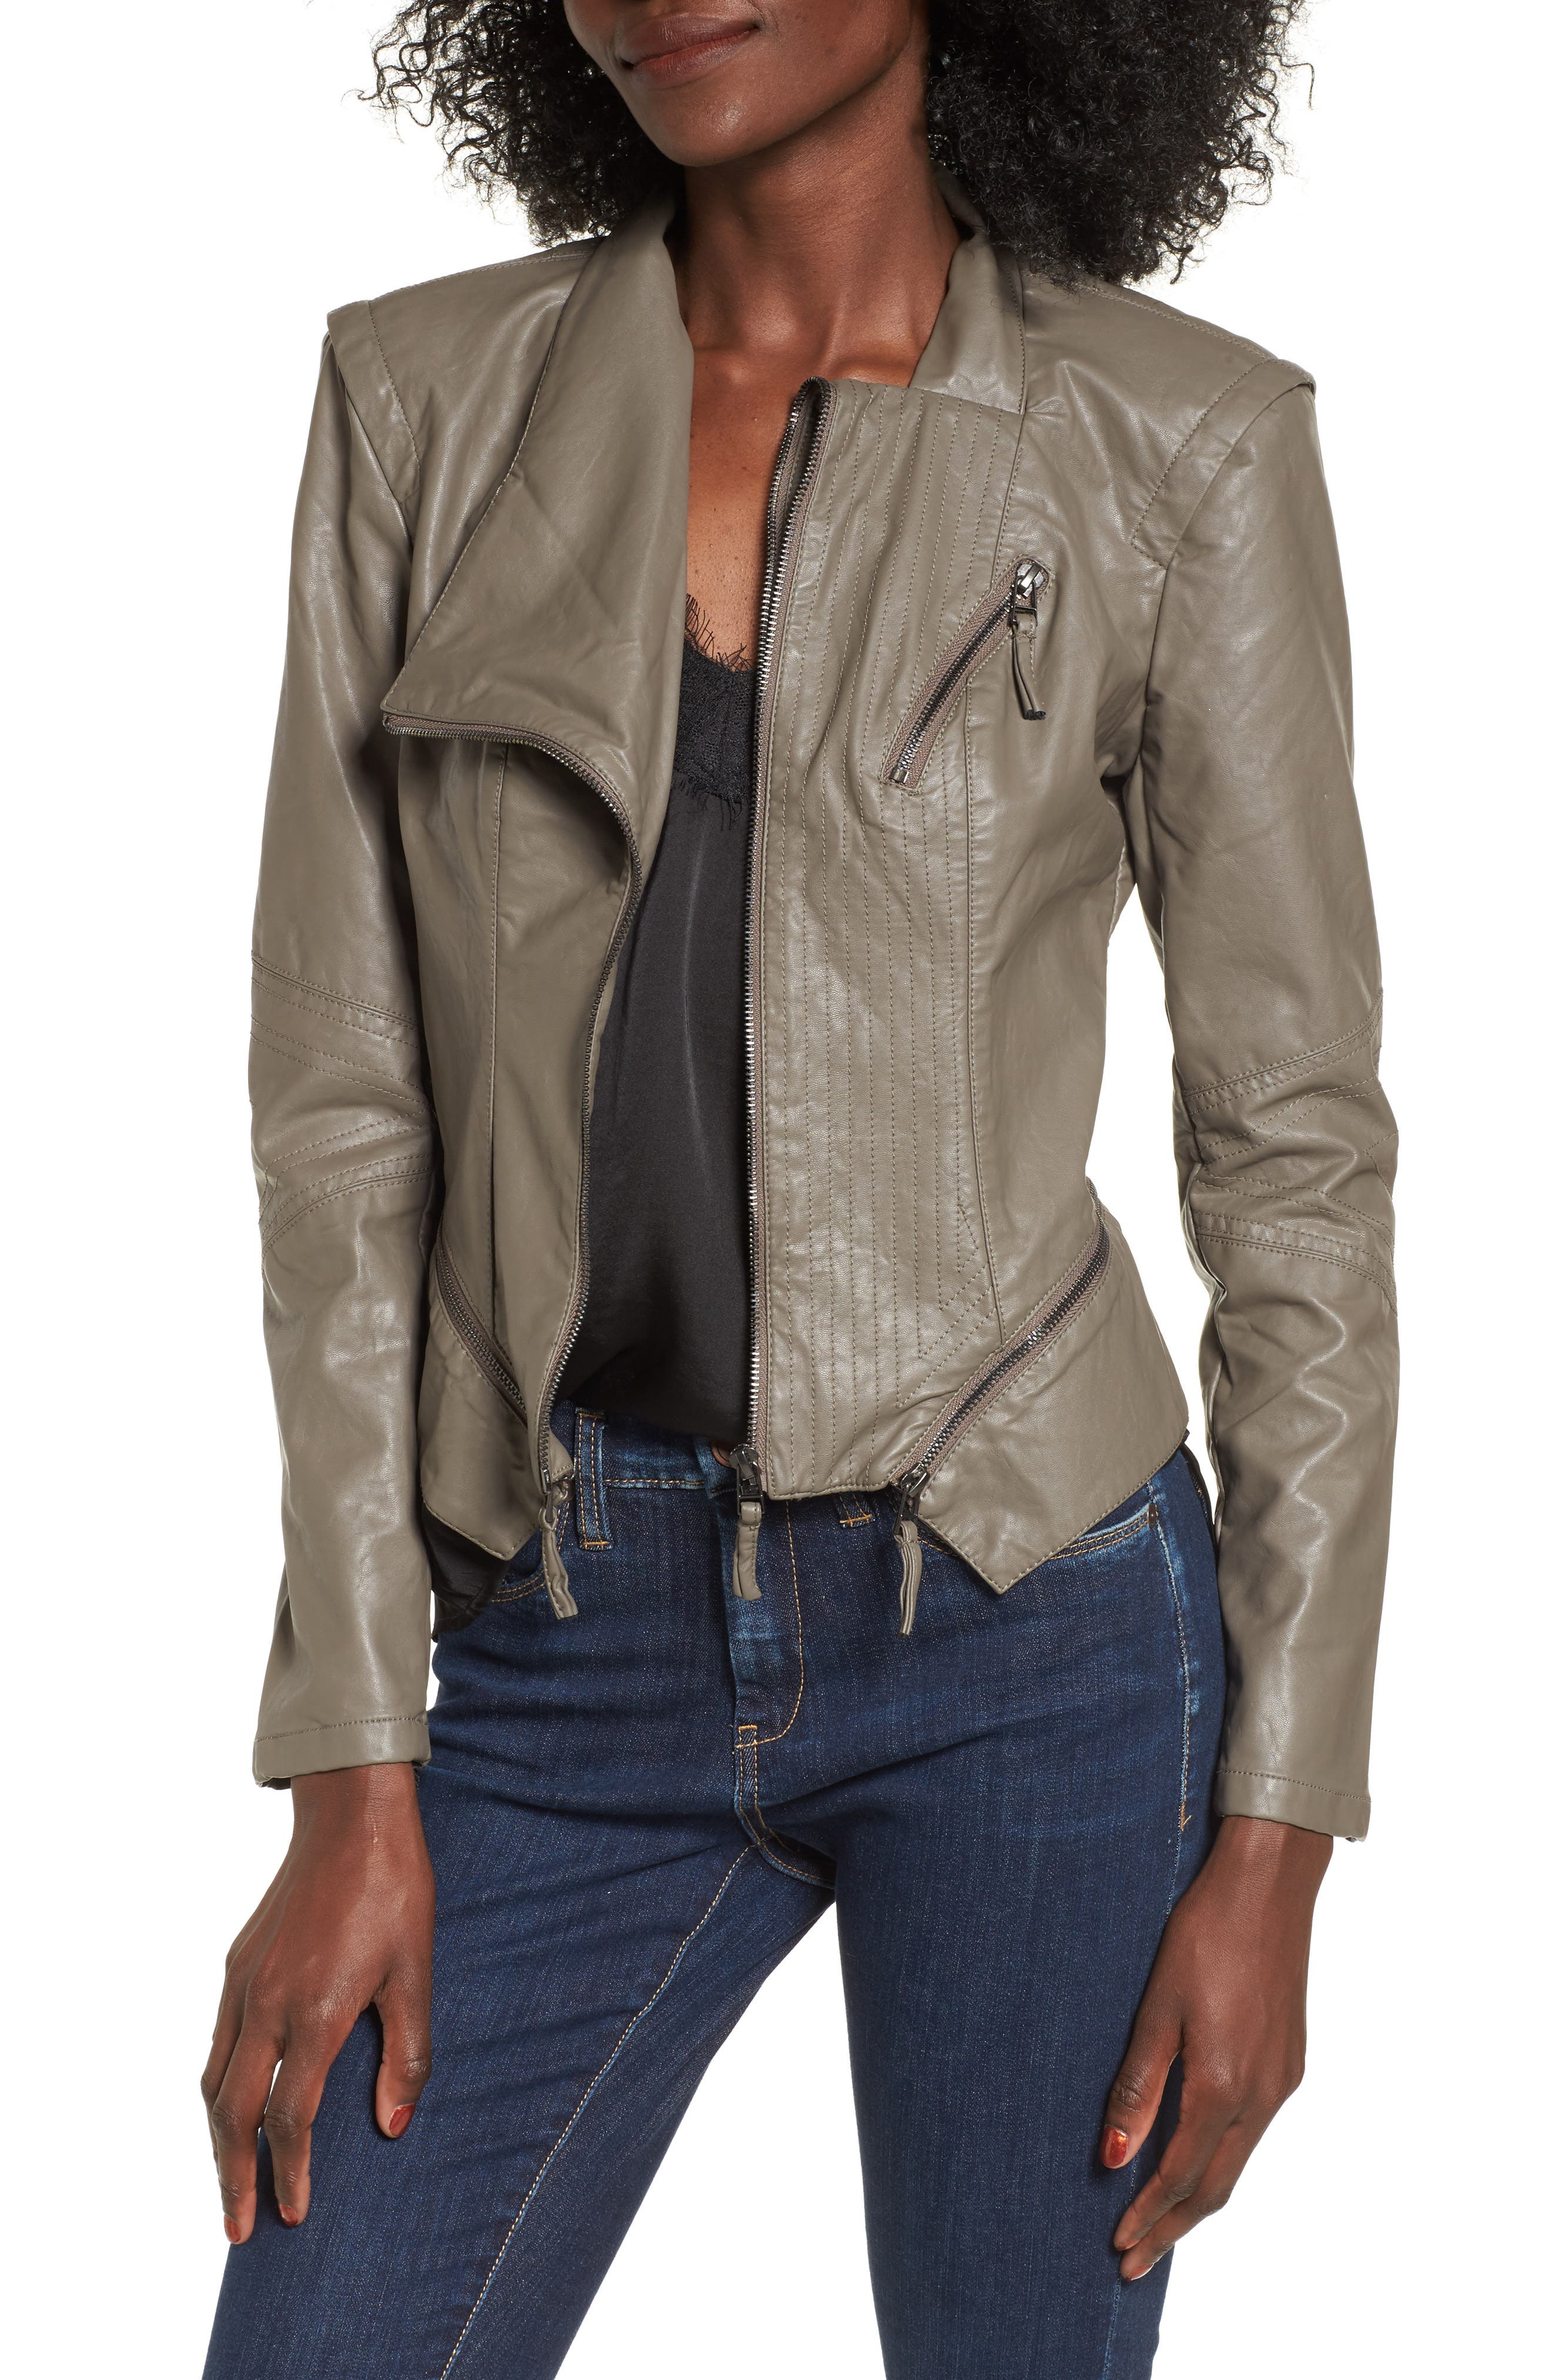 Croped leather jacket